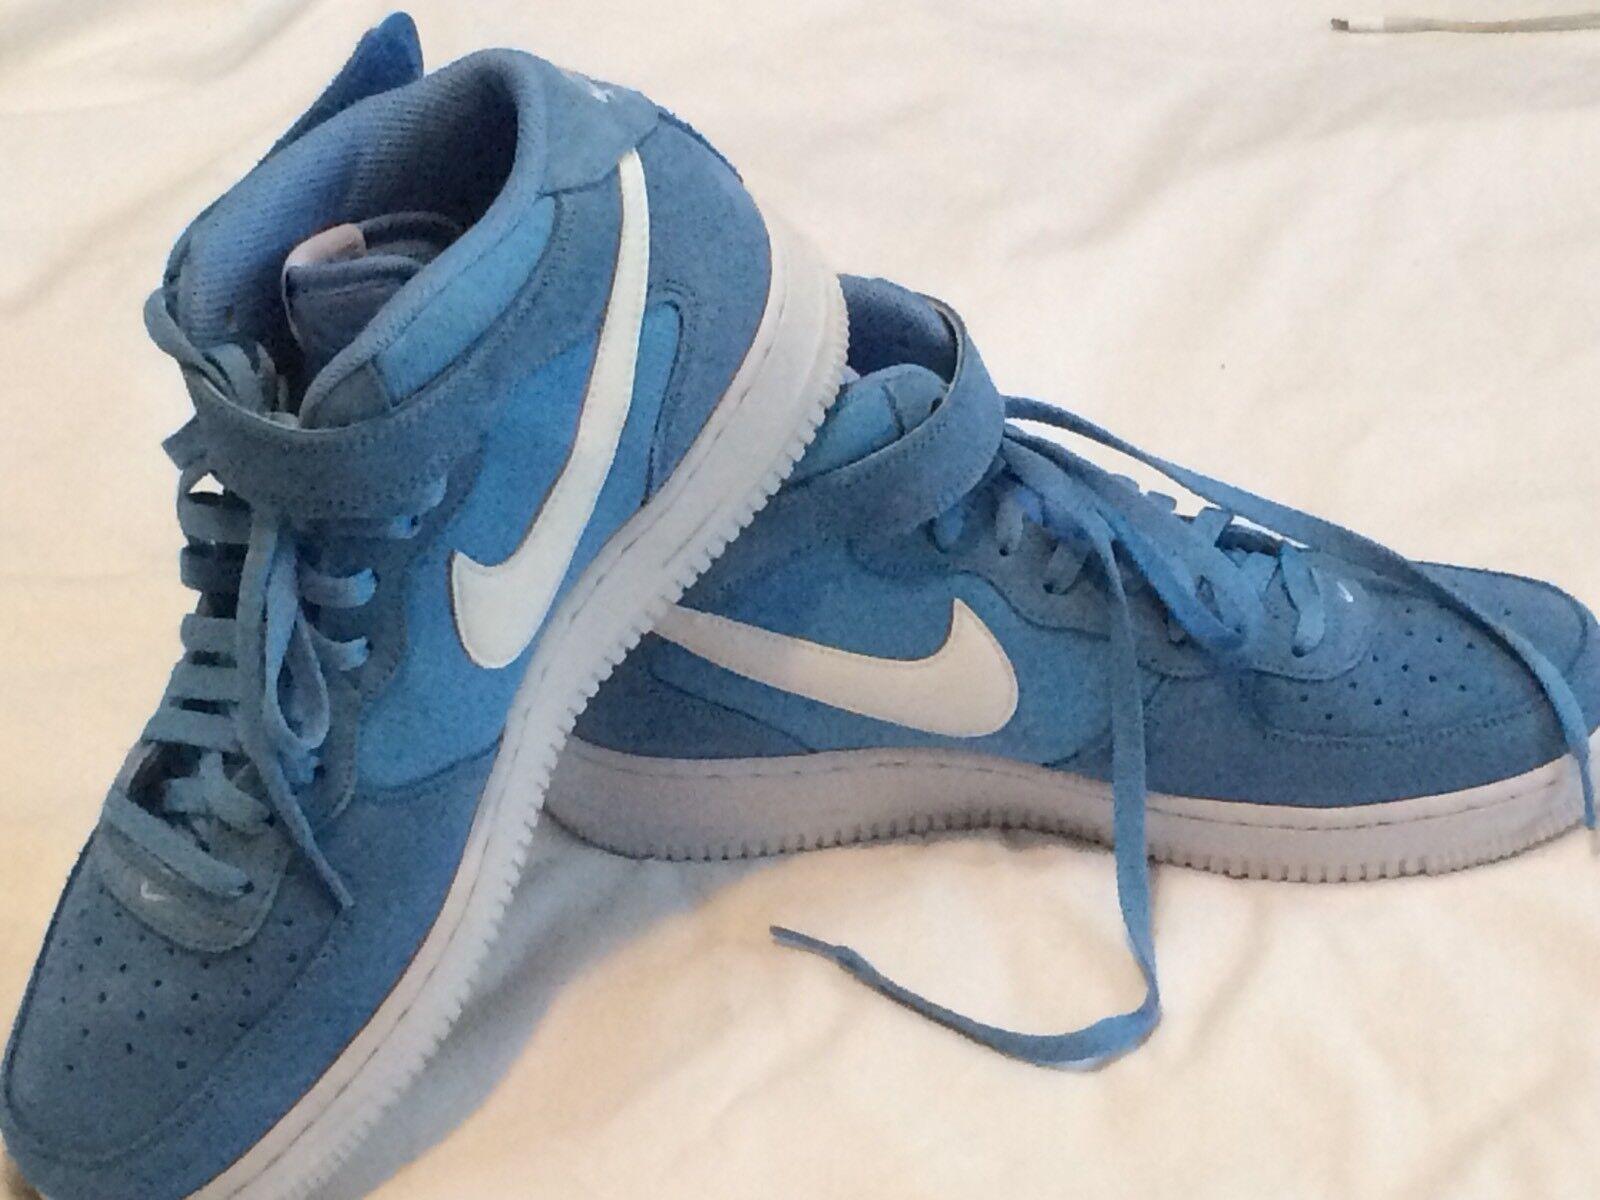 Nike air force 1 metà uomini scarpe da basket universitario 315123-409 blu / bianco